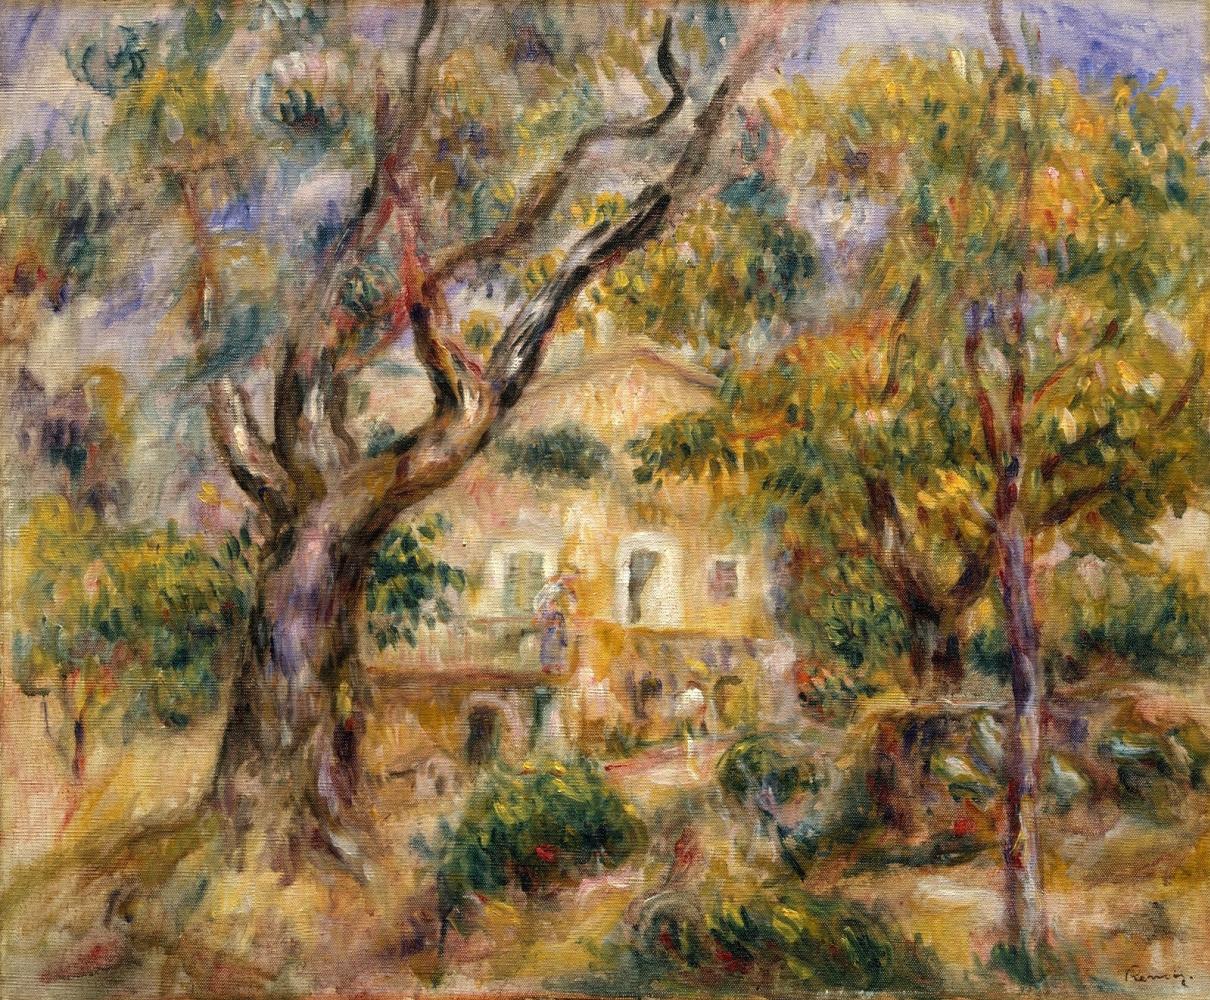 Pierre-Auguste Renoir. Manor Collet, Cagnes sur Mer